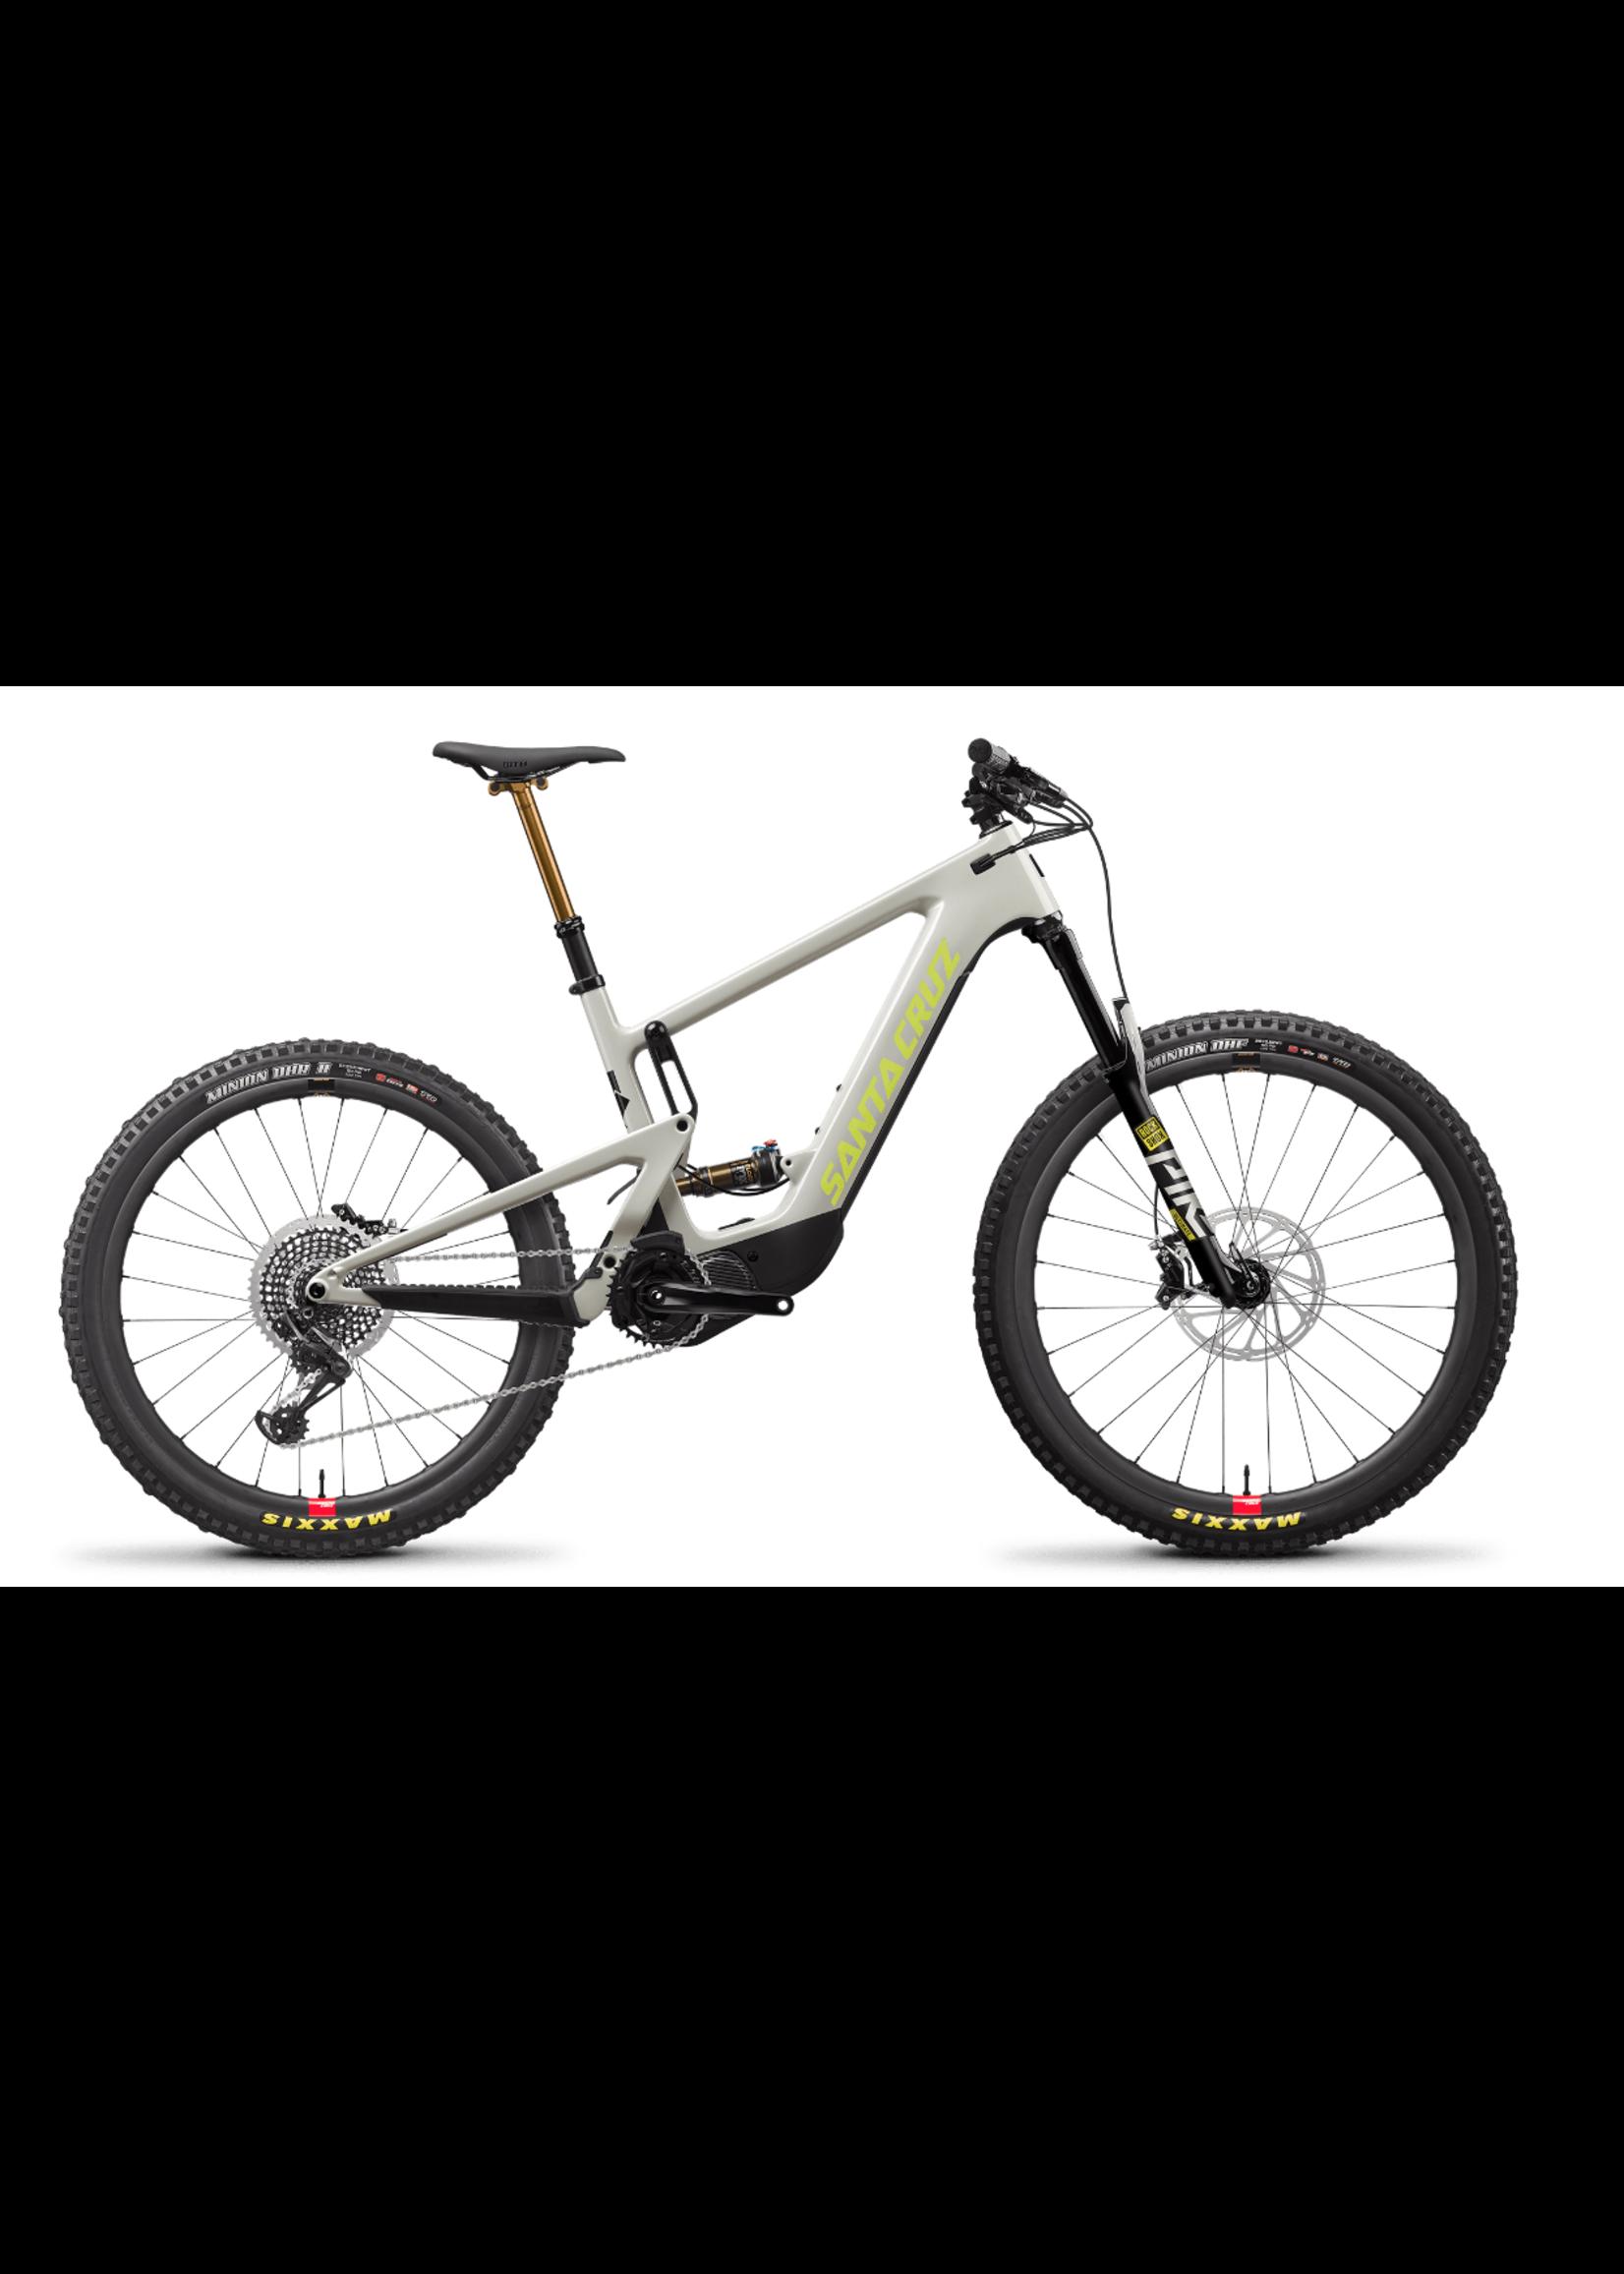 Santa Cruz Bicycles Santa Cruz Heckler CC MX, X01 Reserve Wheels